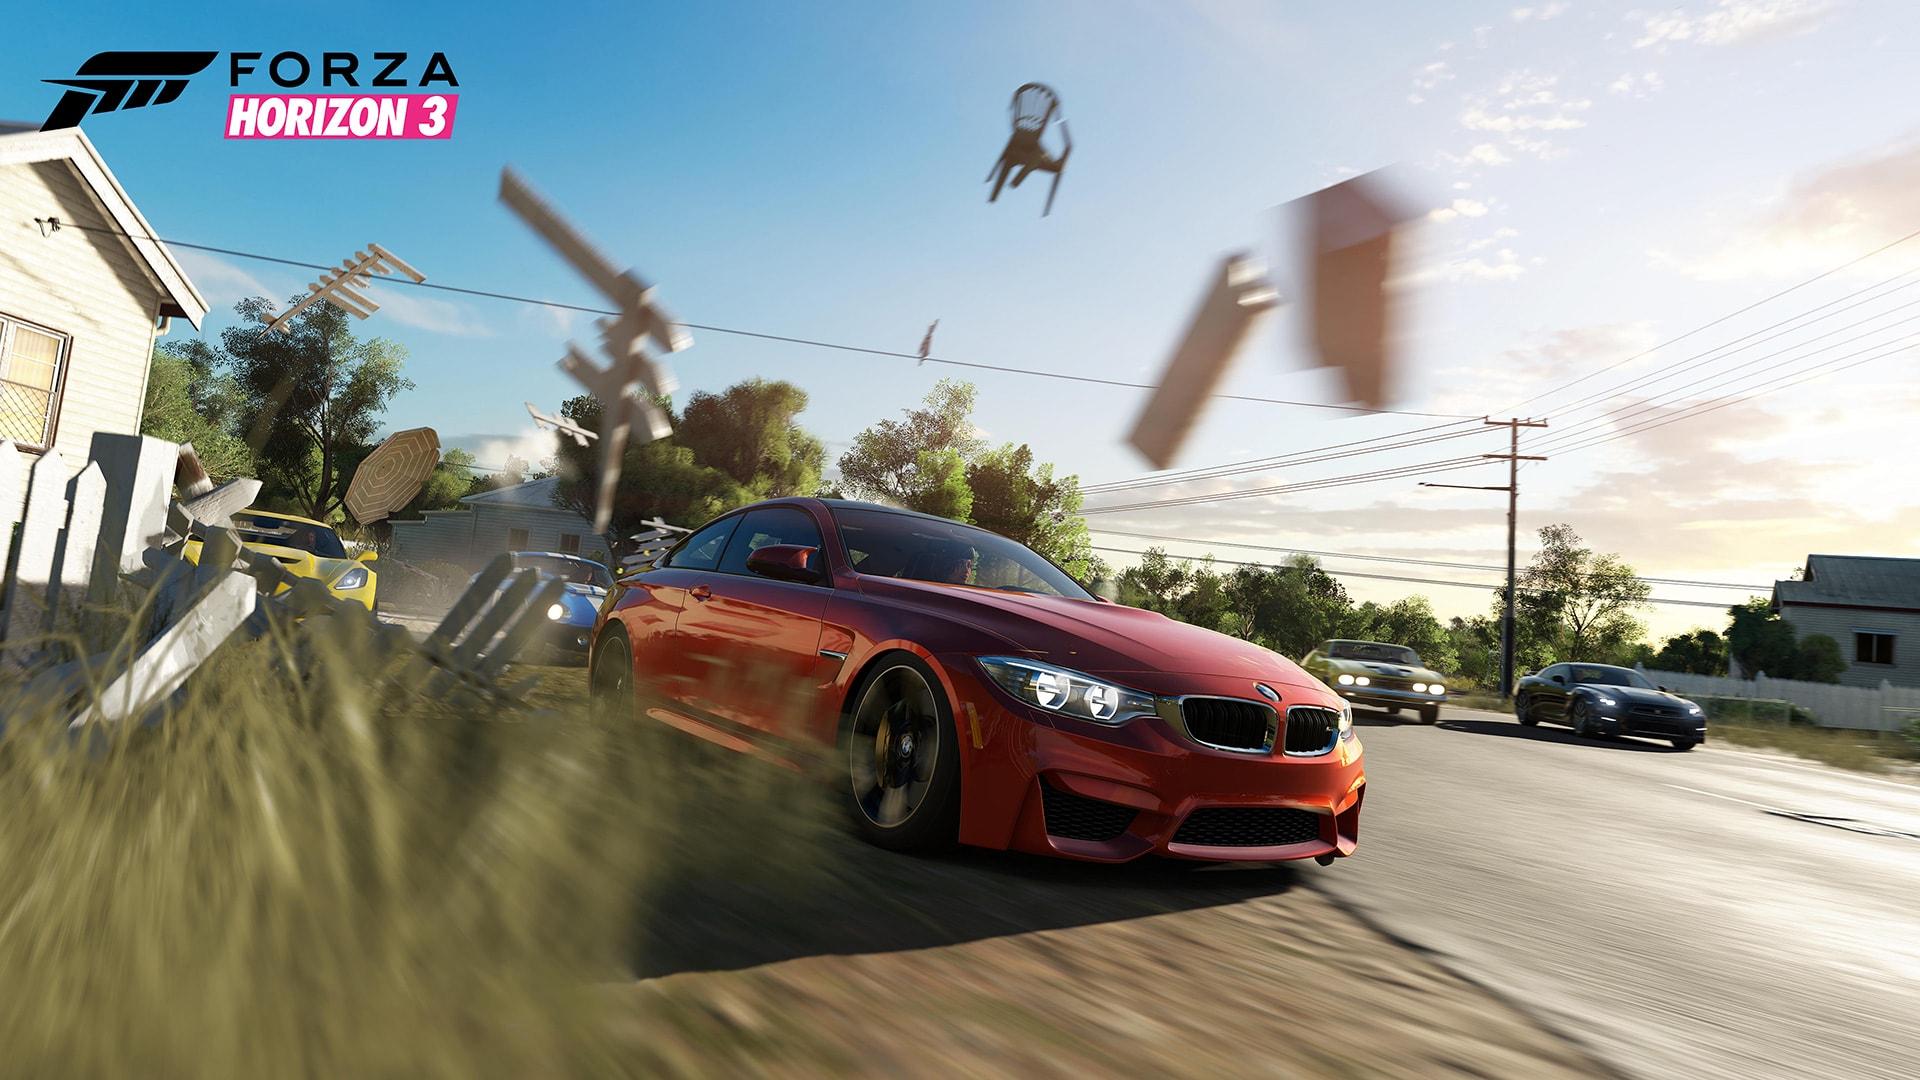 Forza Horizon 3 widescreen wallpapers